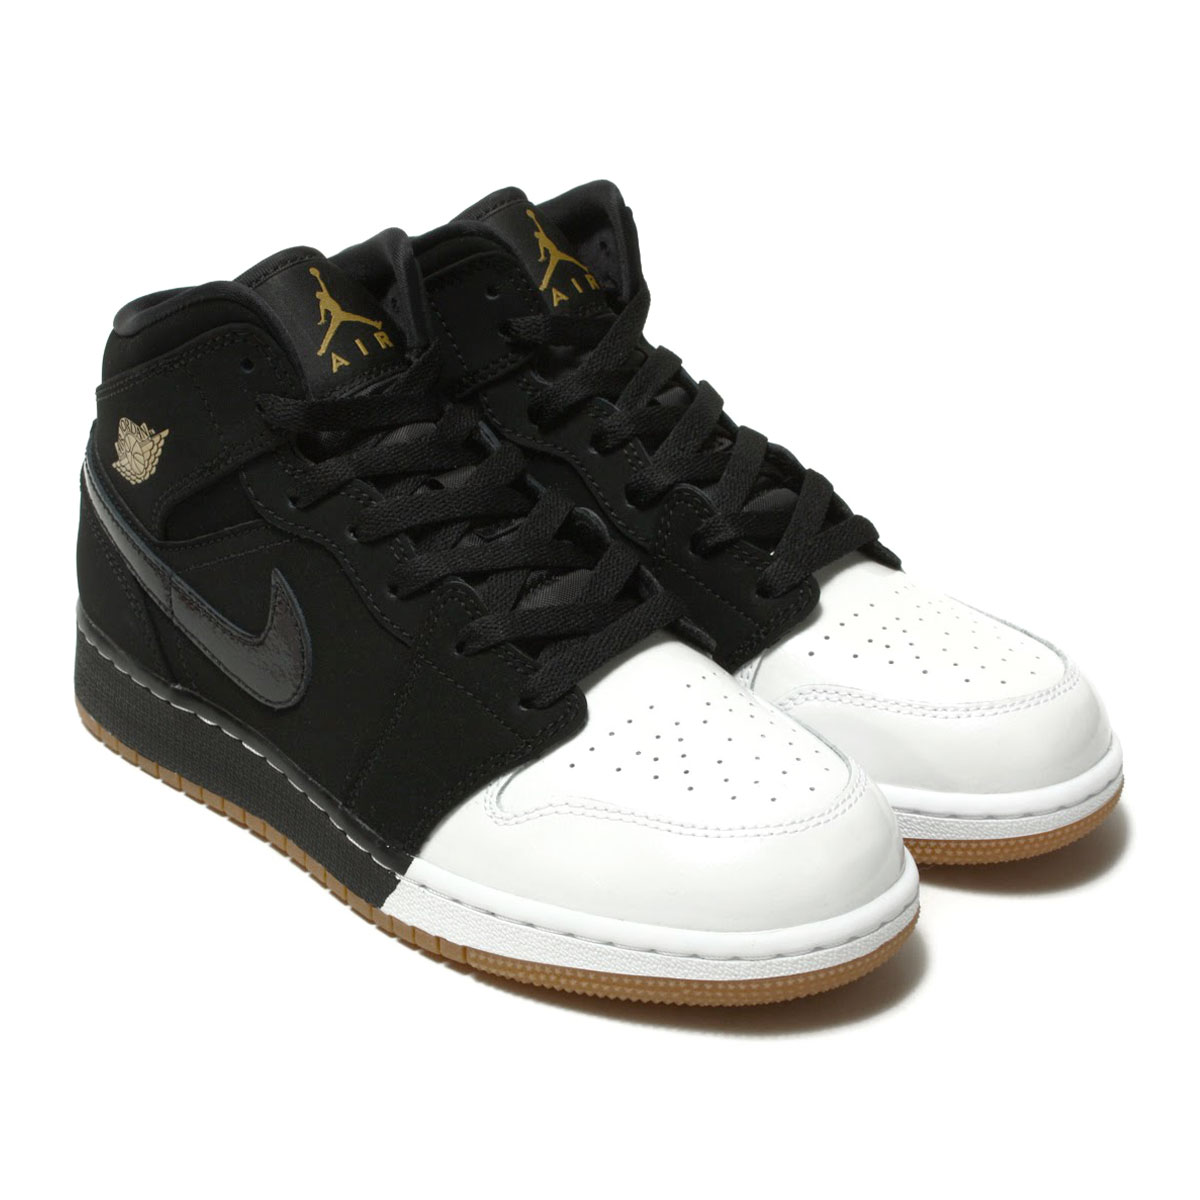 3f0c31ae32 NIKE AIR JORDAN 1 MID GG (Nike Air Jordan 1 mid GG) BLACK/METALLIC  GOLD-WHITE-GUM MED BROWN 18SP-I